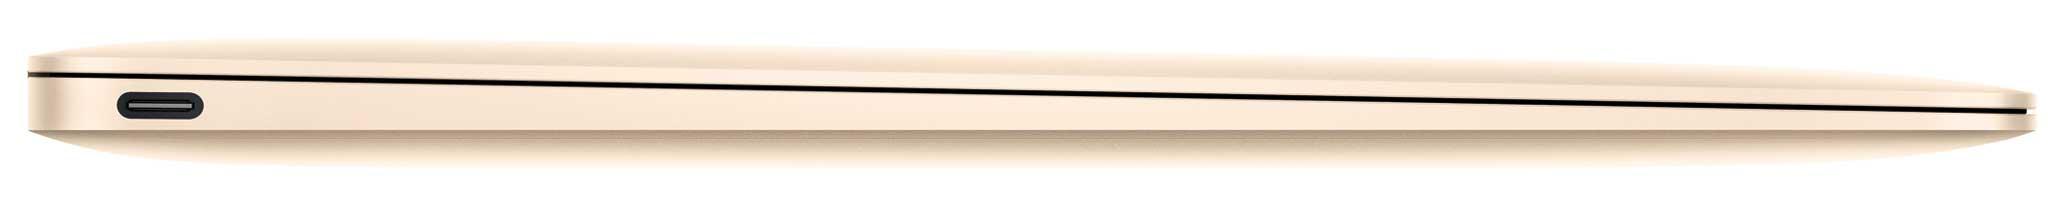 gold-macbook-usbc-edge